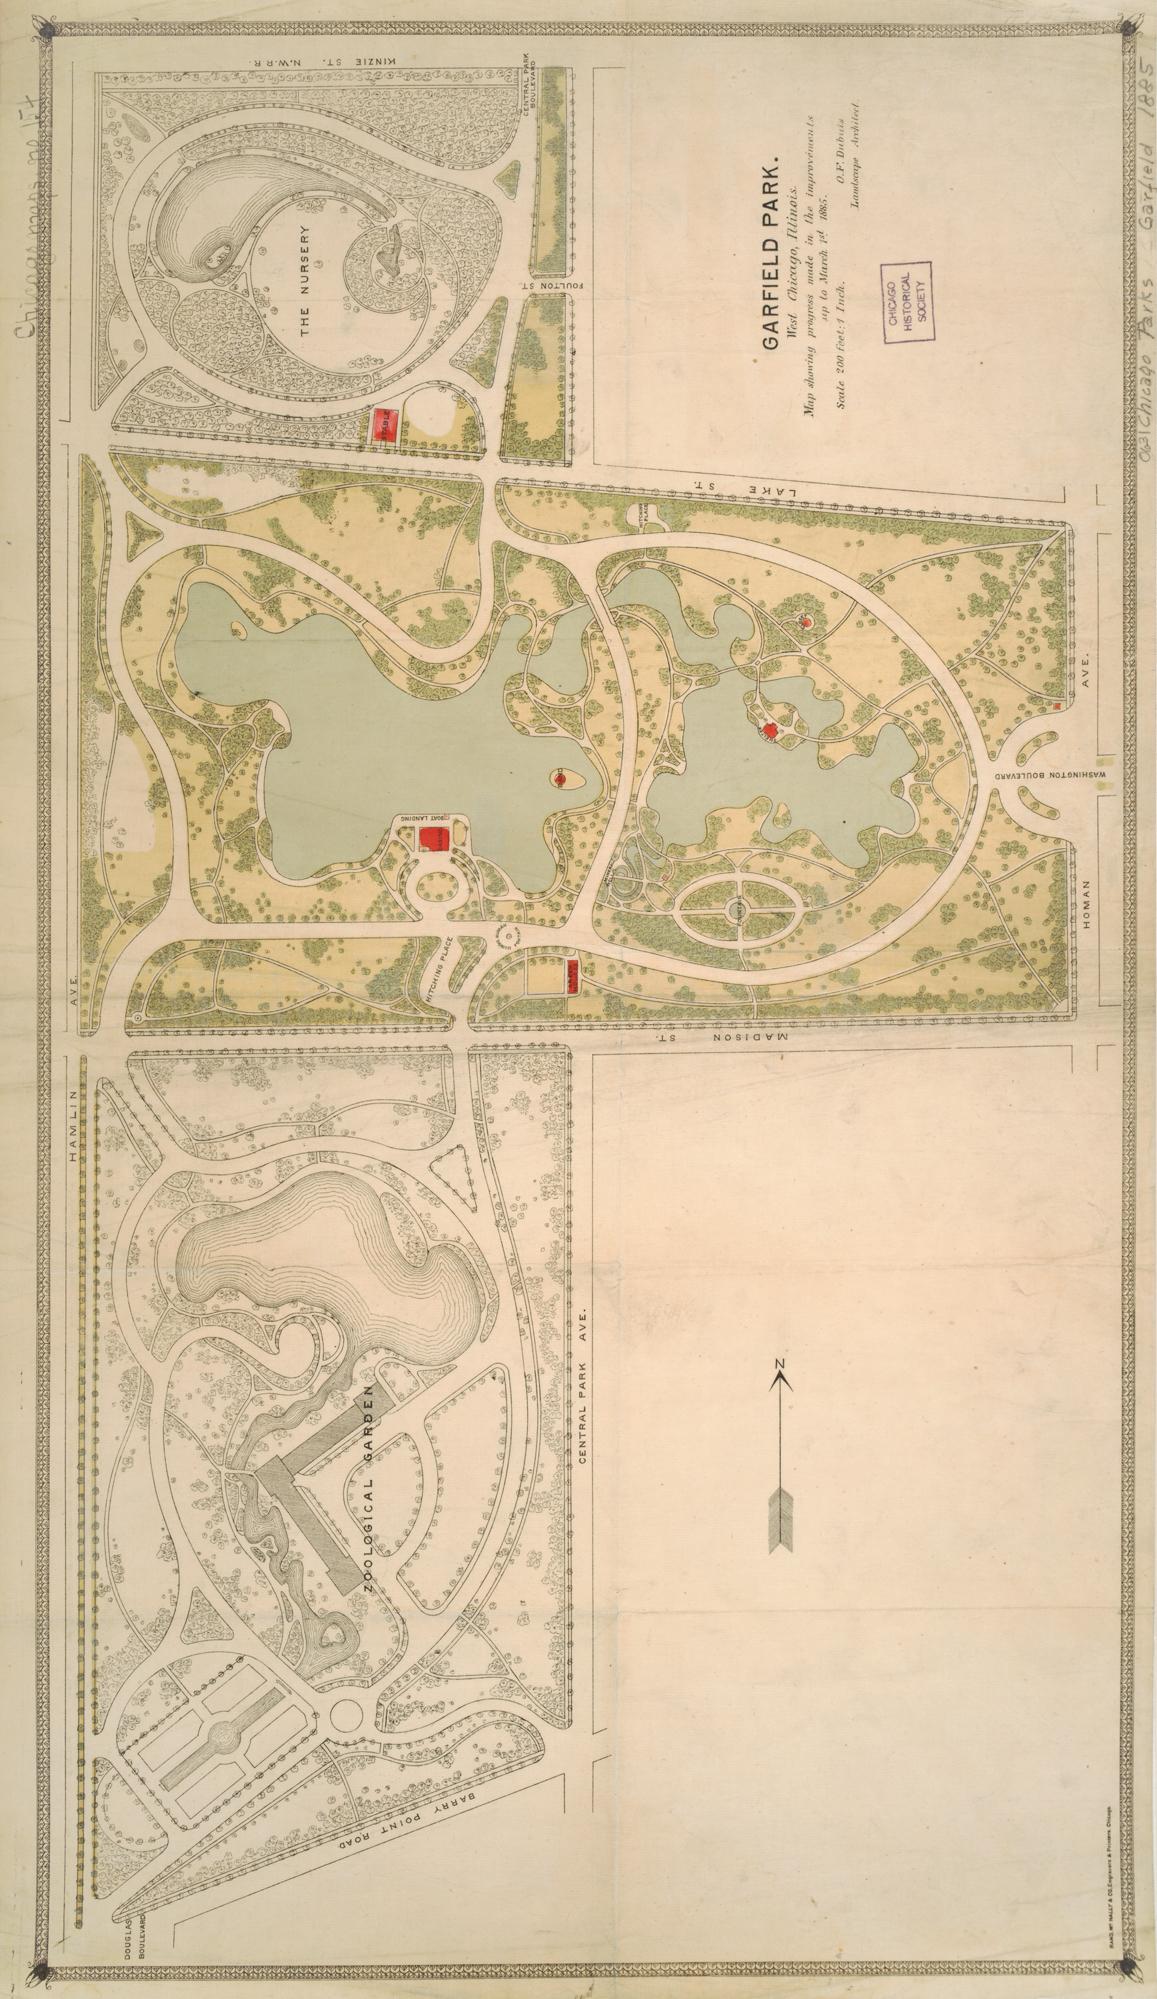 Garfield Park Chicago Map.Garfield Park Map 1885